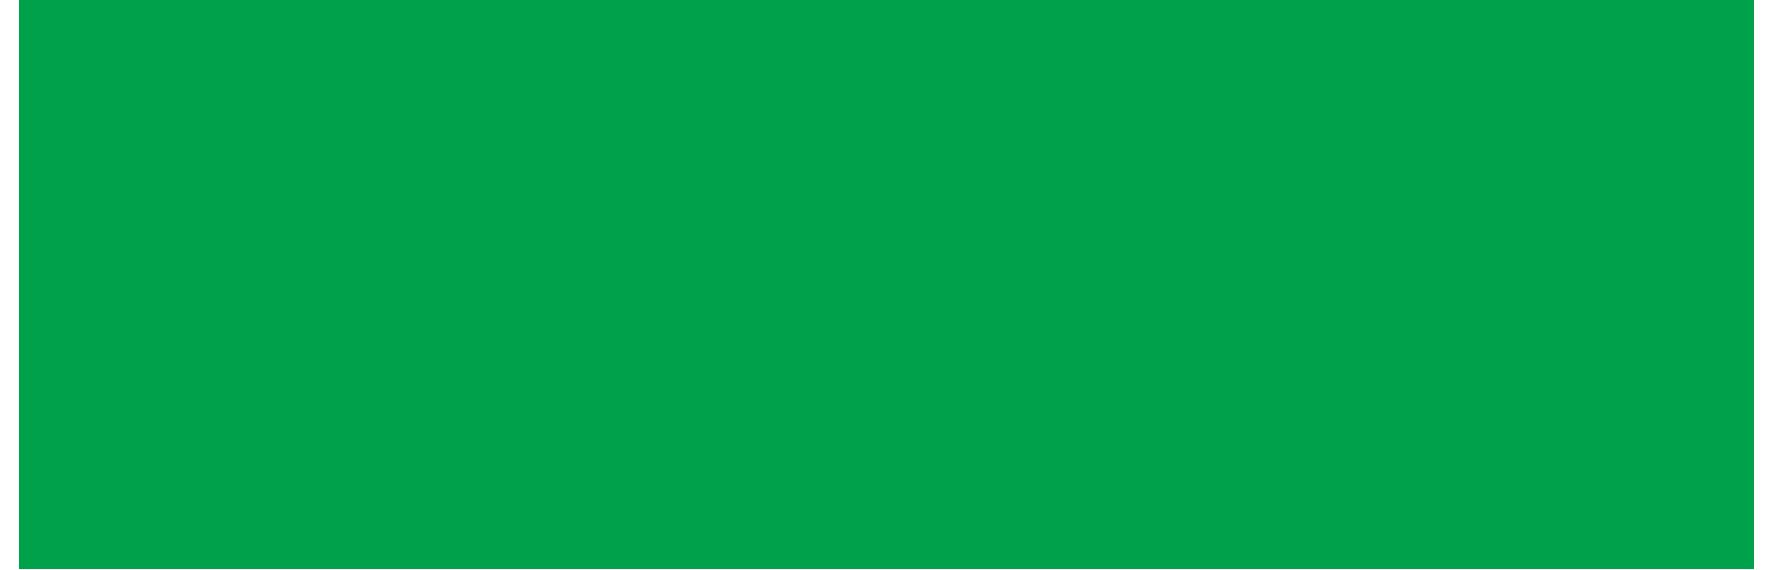 Logo-WebDigital-Tagline-Verde-deschis-(#00a14b)